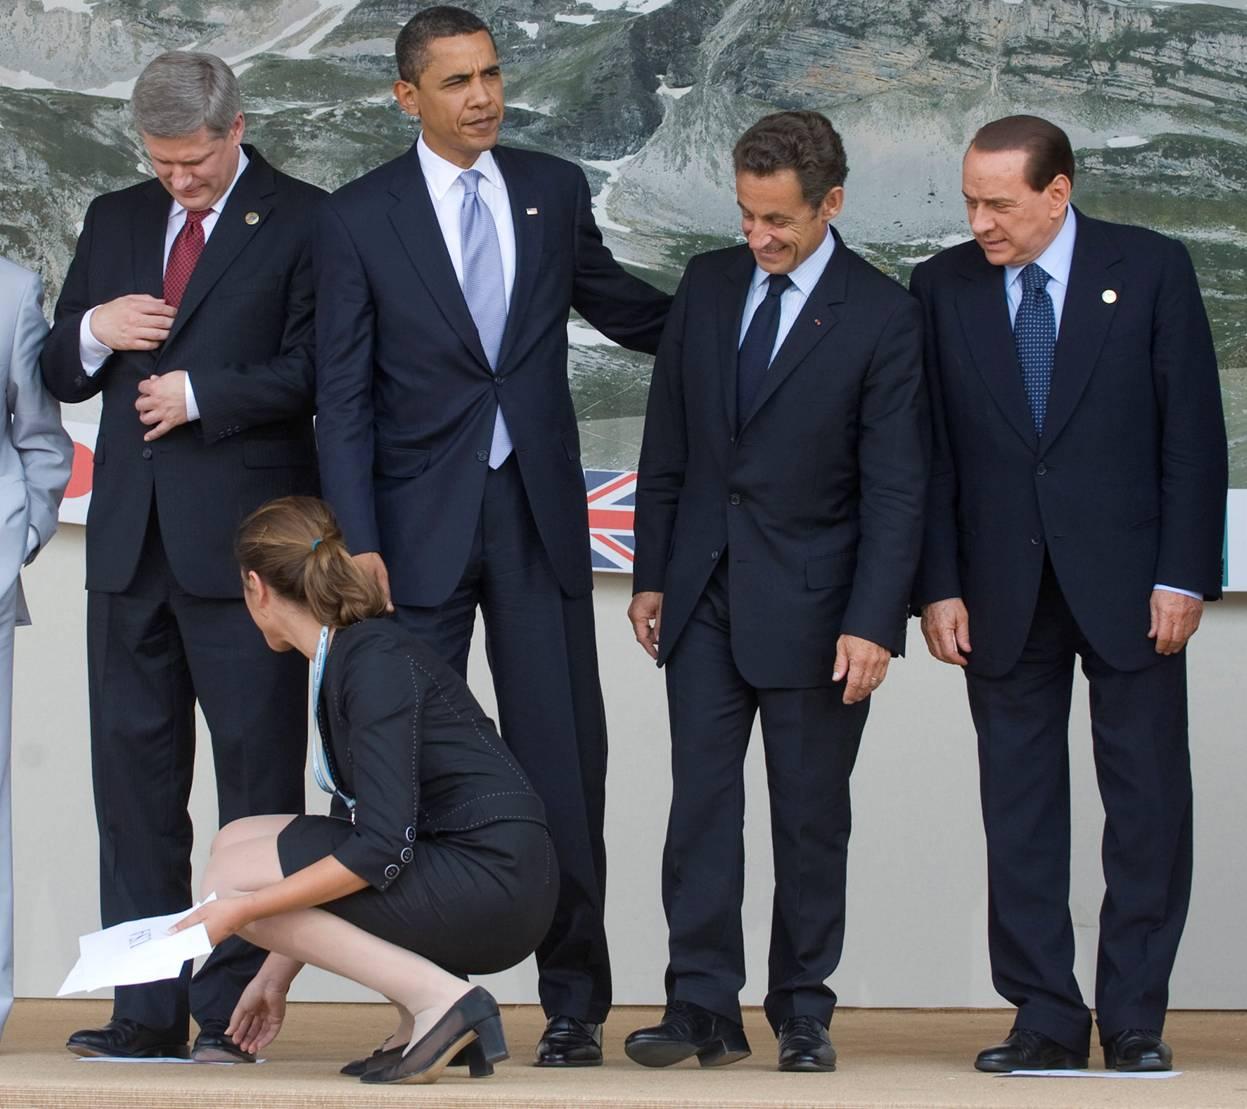 Berlusconi Harper Obama Sarcozy